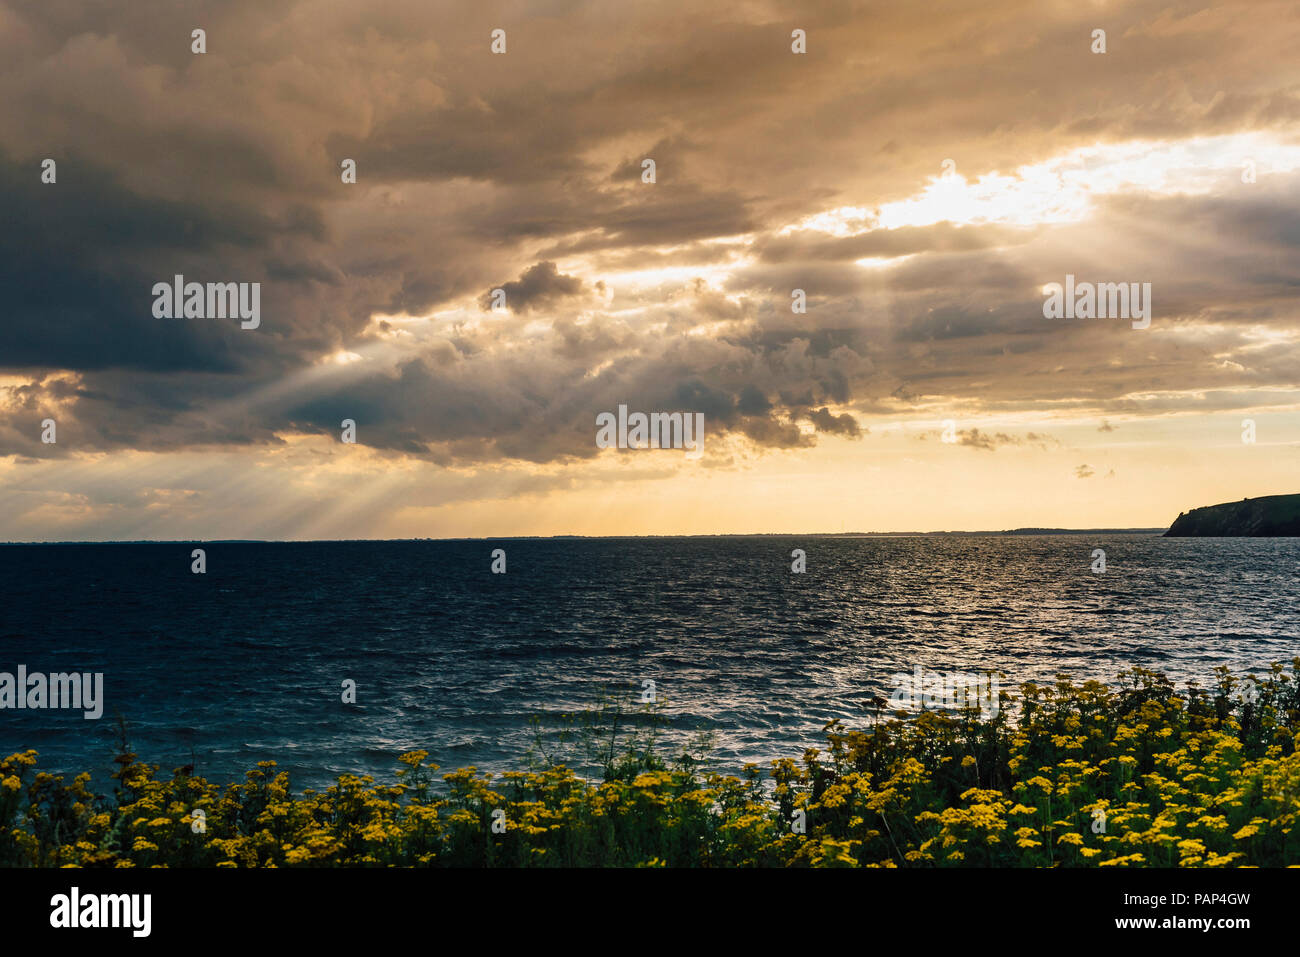 Germany, Ruegen, coast and Baltic sea under cloudy sky - Stock Image